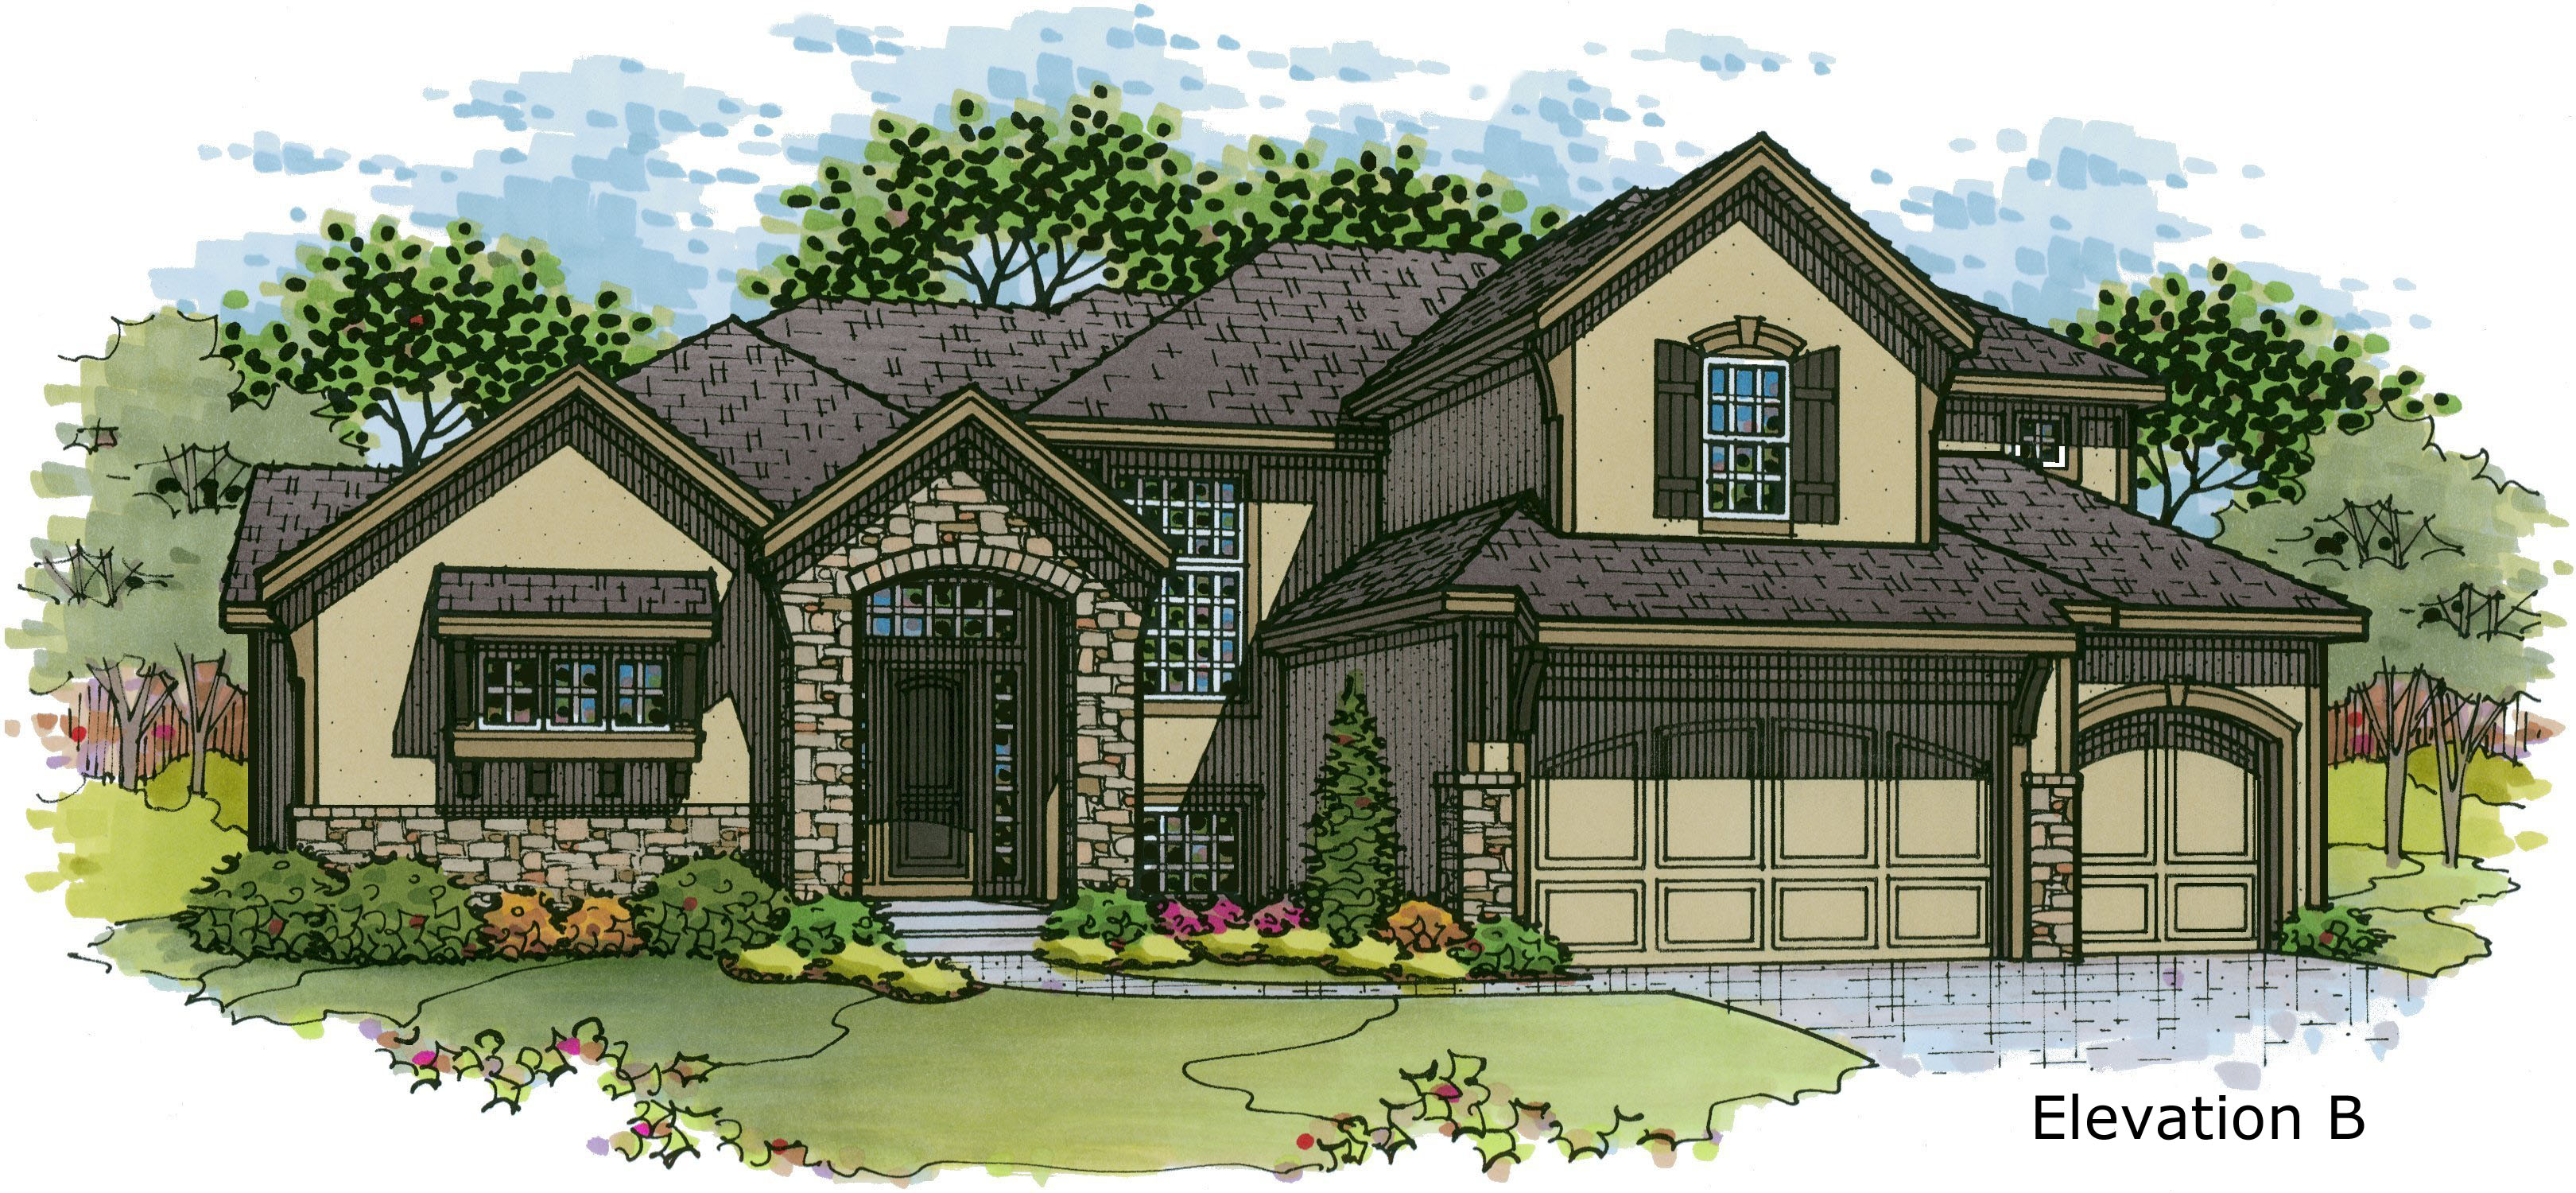 Cimarron elevation B color rendering